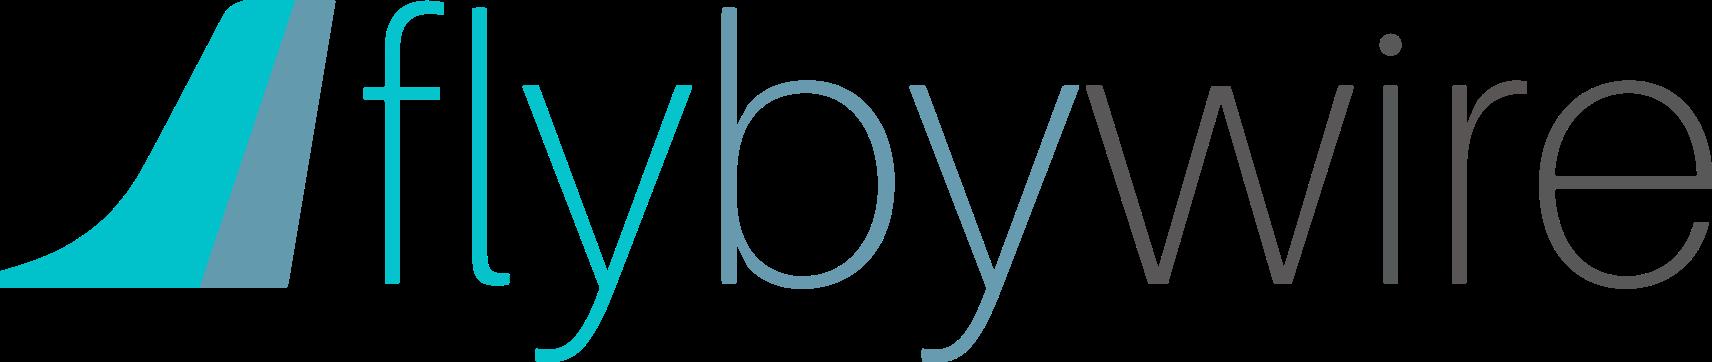 FBW-Logo.png